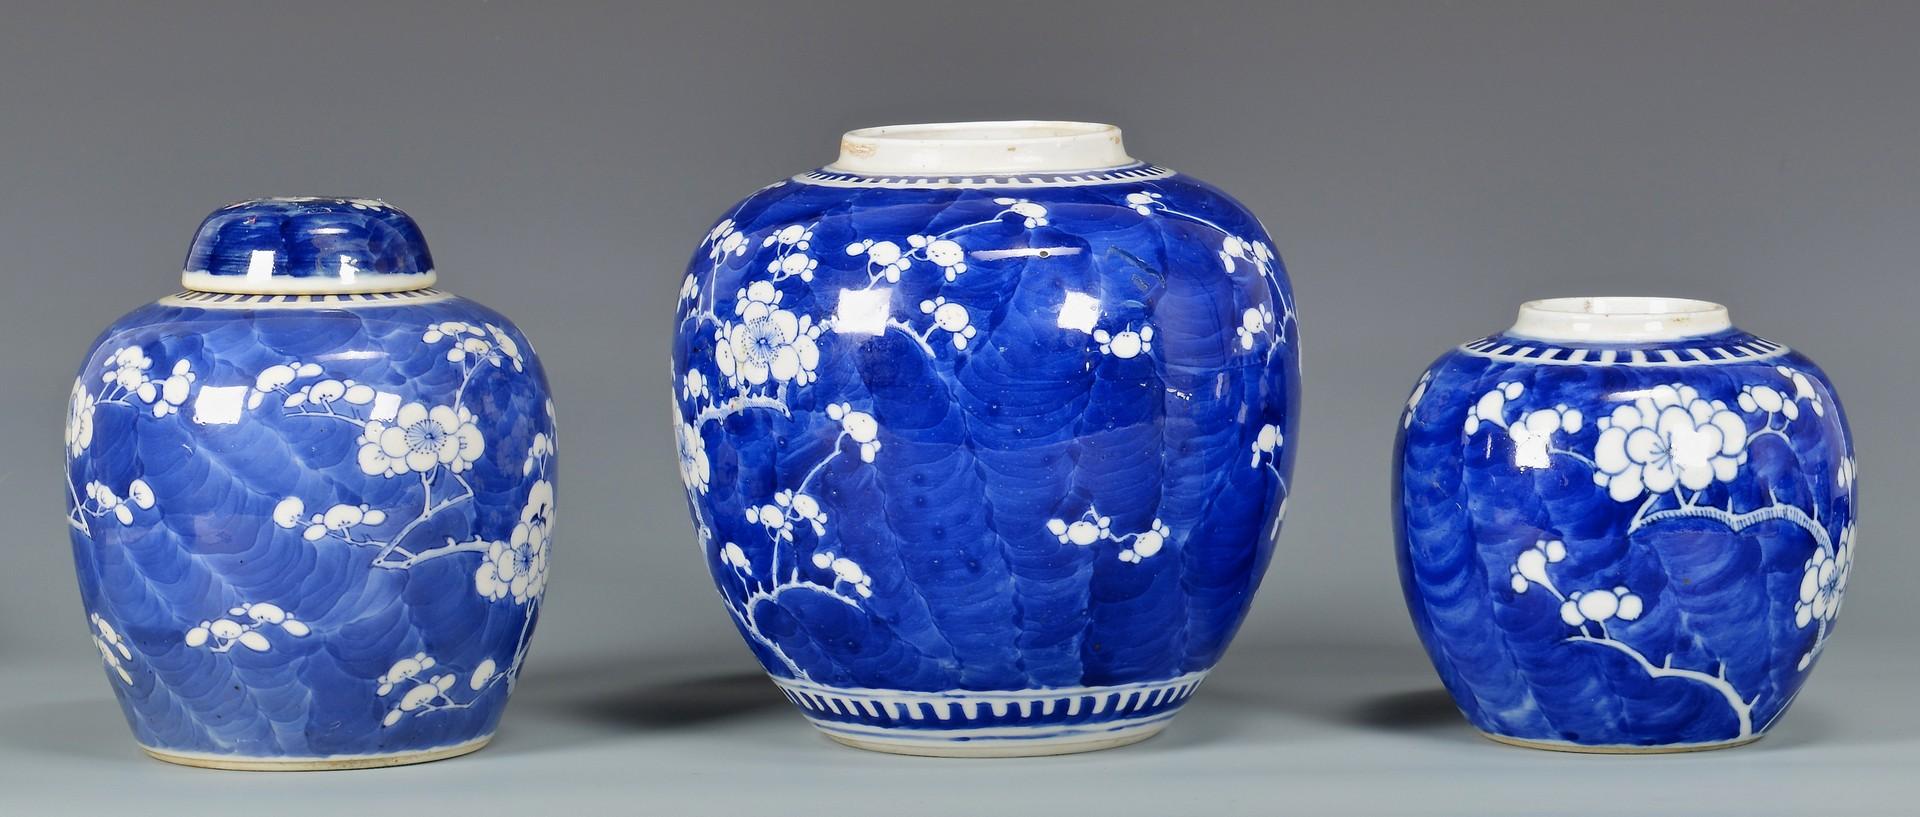 Lot 778: 6 Chinese Porcelain Hawthorne Pattern Ginger Jars